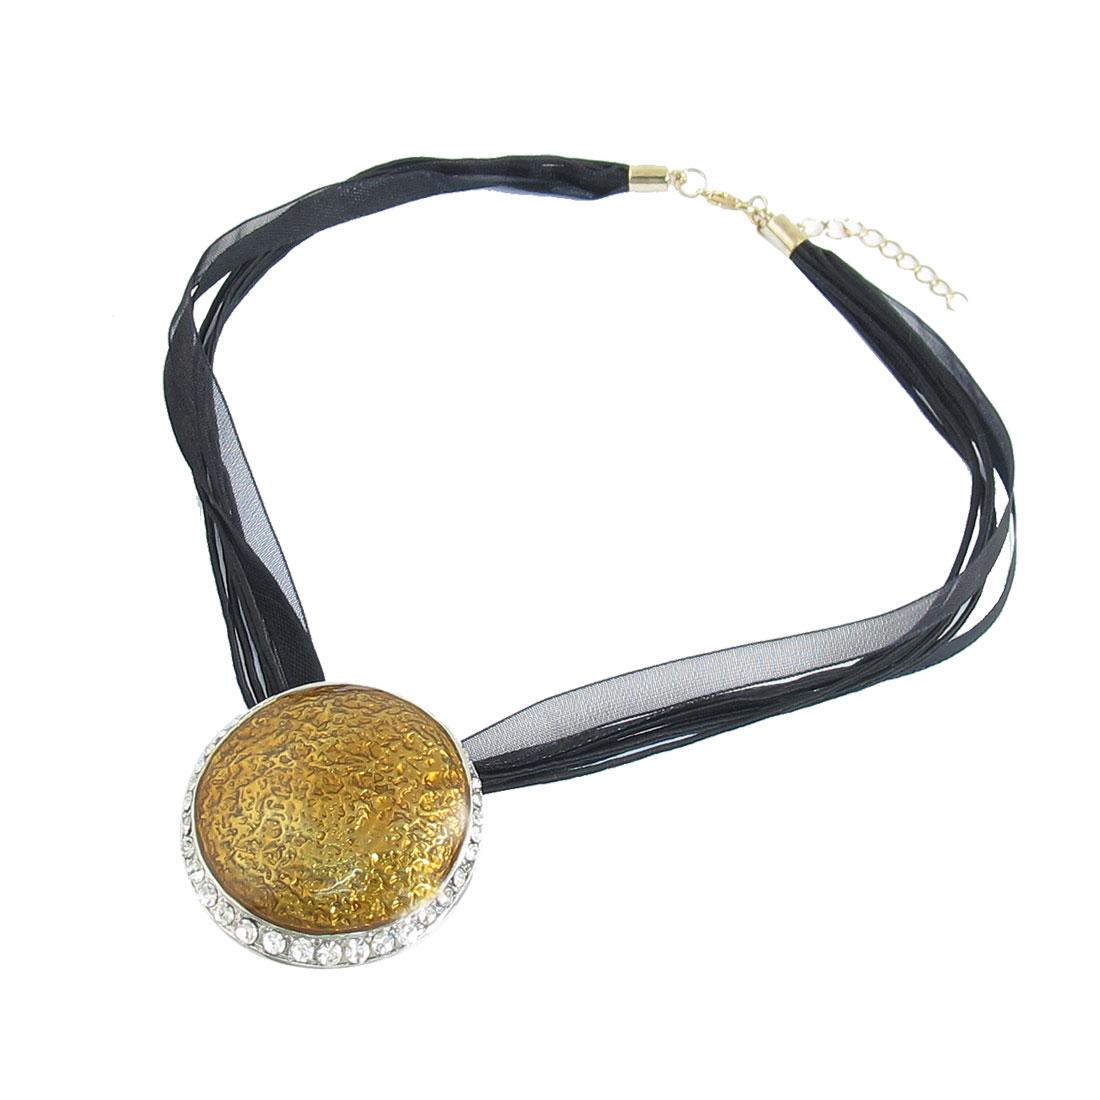 Gold Tone Decor Round Pendant Black Nylon Multi String Necklace for Ladies